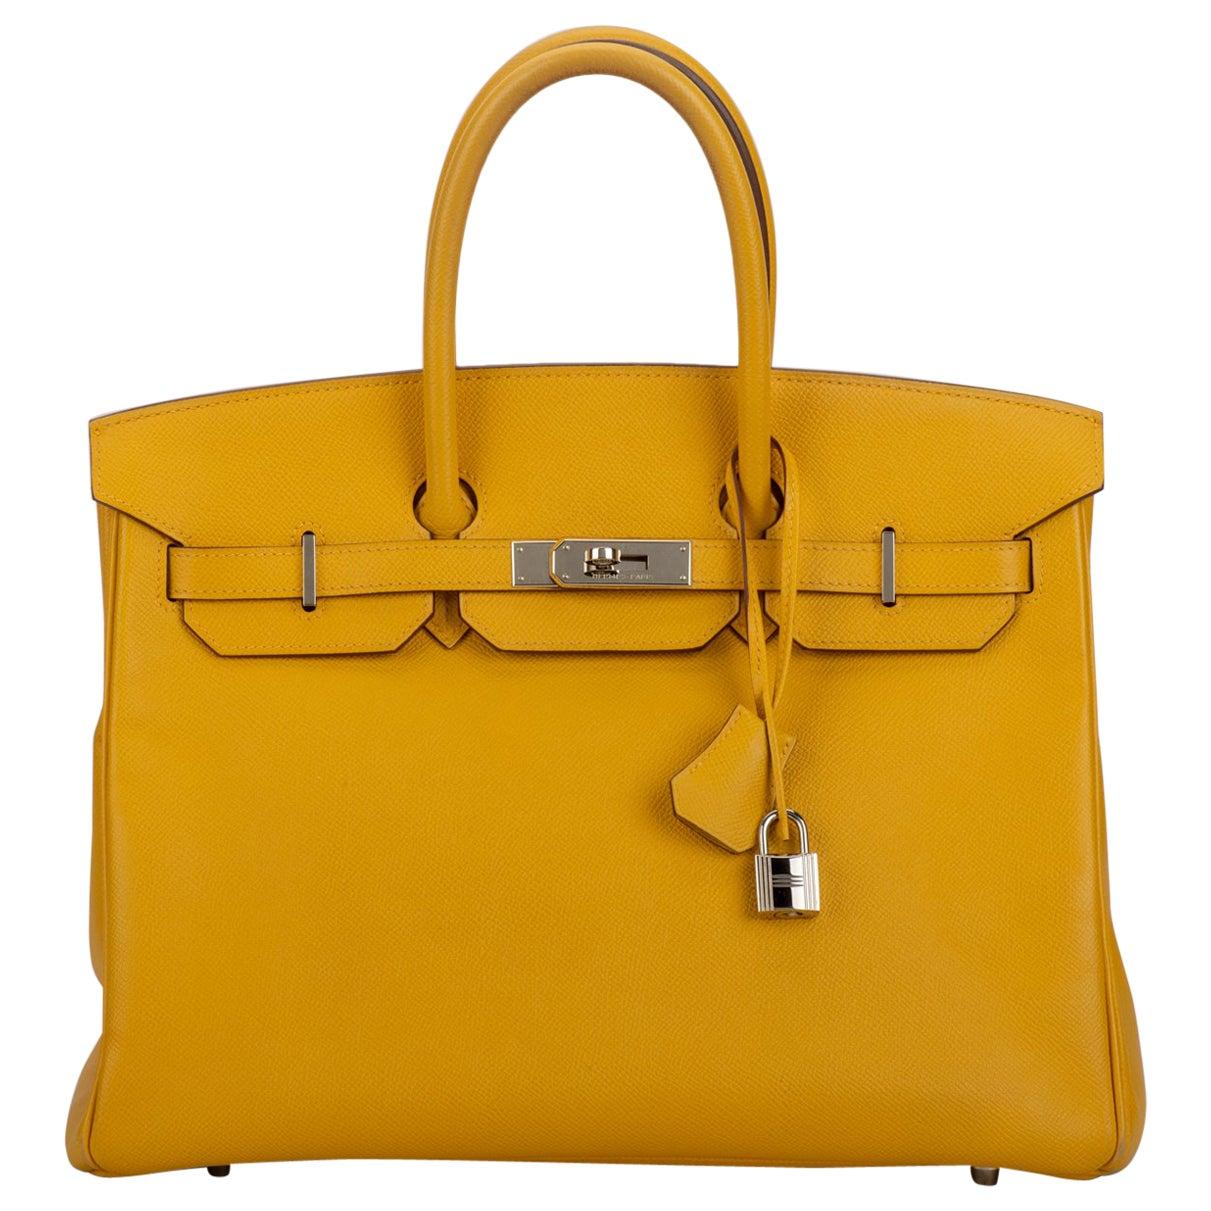 Hermes Birkin 35 Jaune d'or Yellow Min Condition